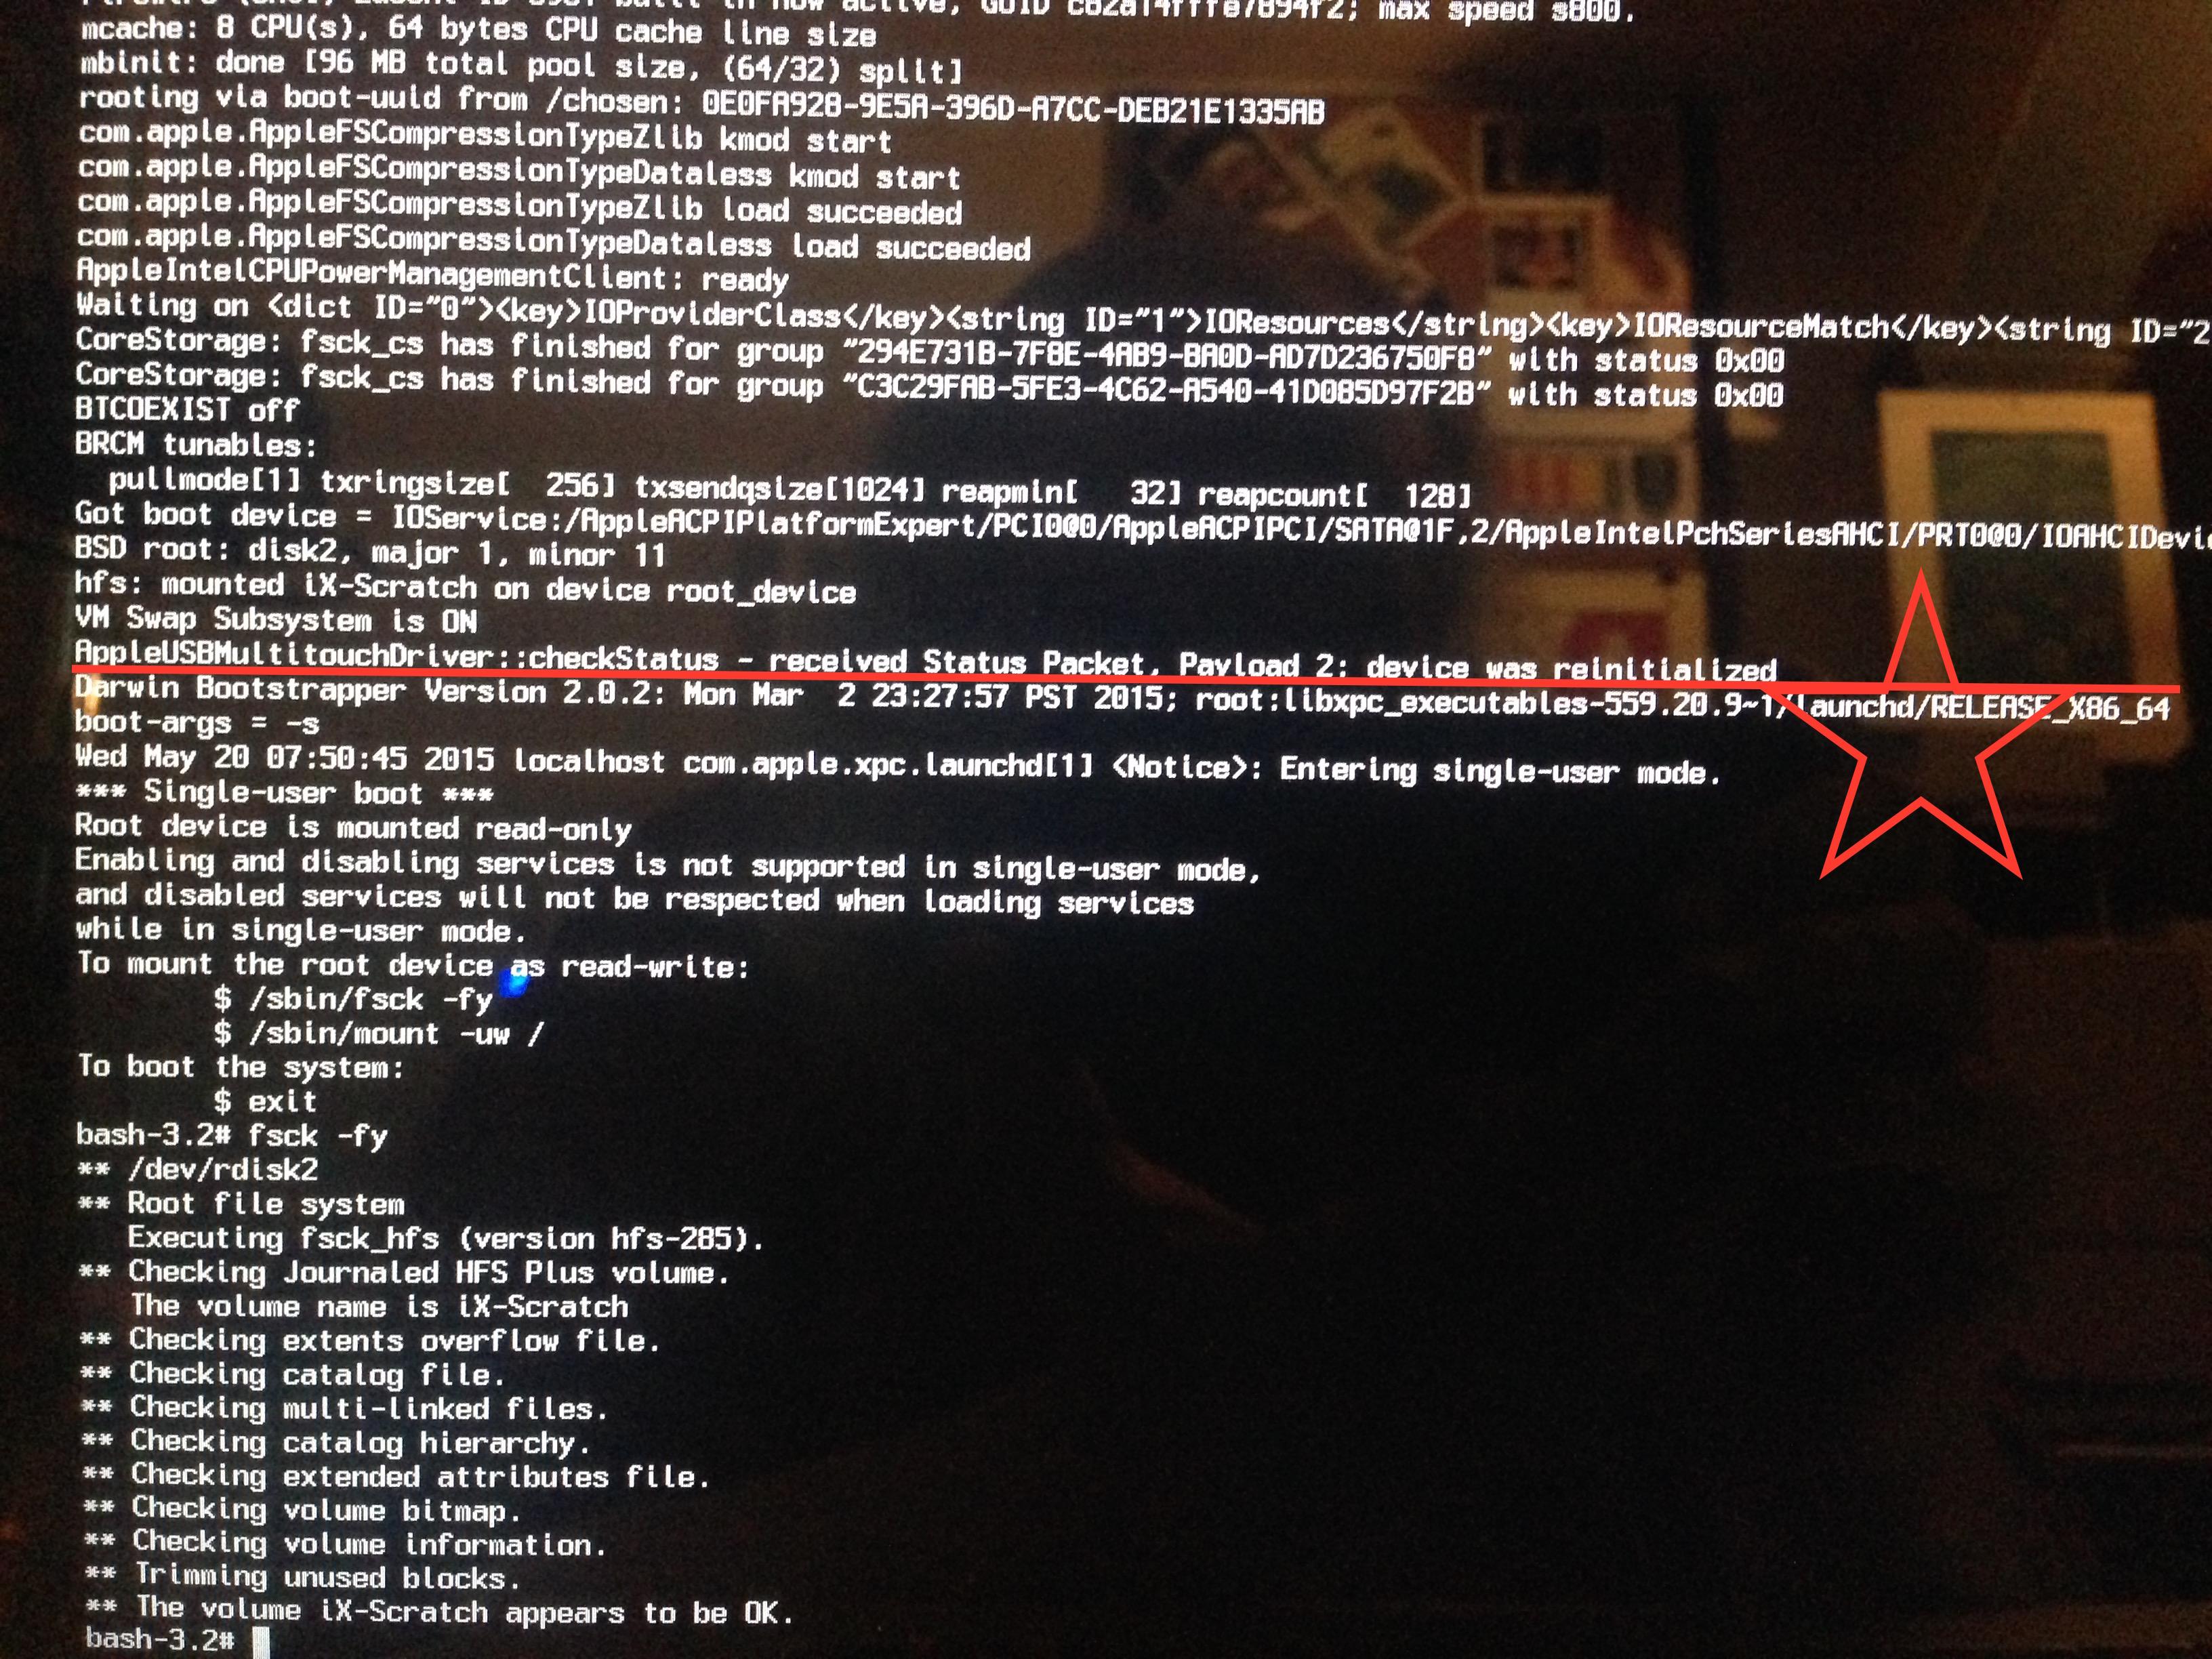 Yosemite Macbooks stuck at 50% boot (Progress Bar